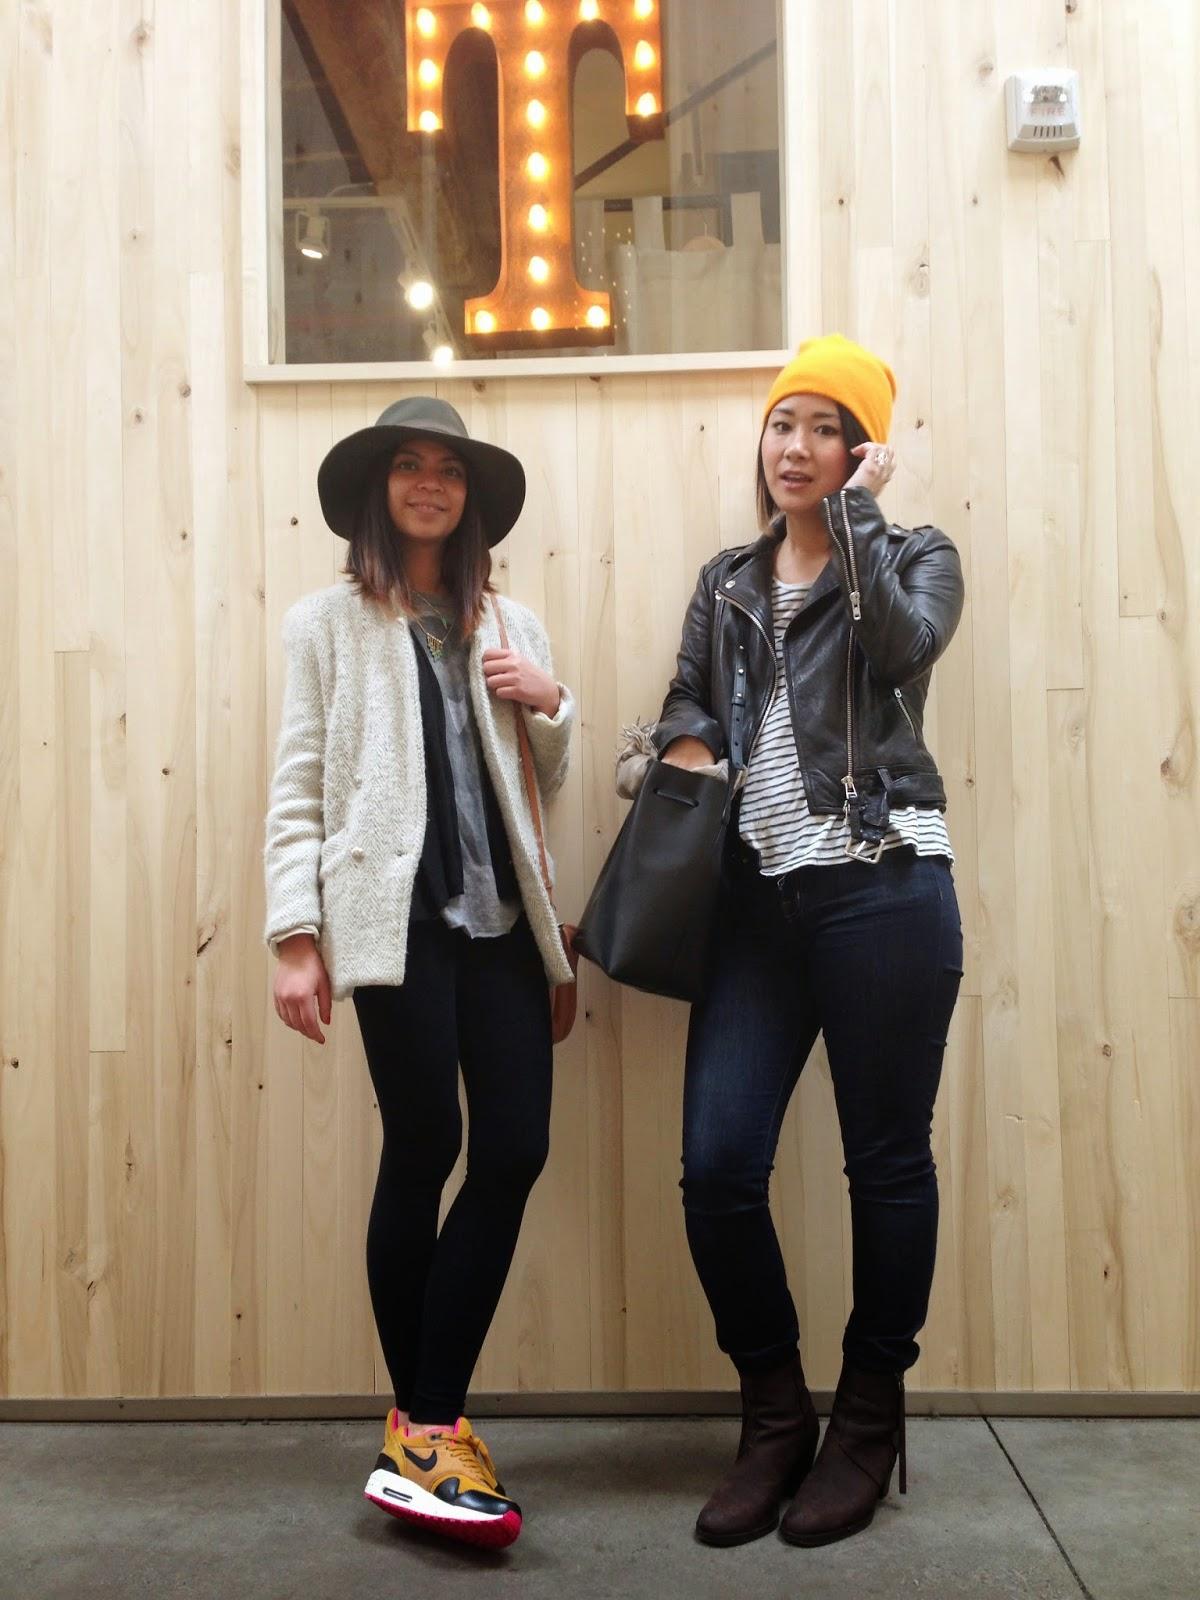 yoshimipine portland blogger filipino fashionista nike airmax outfit of the day